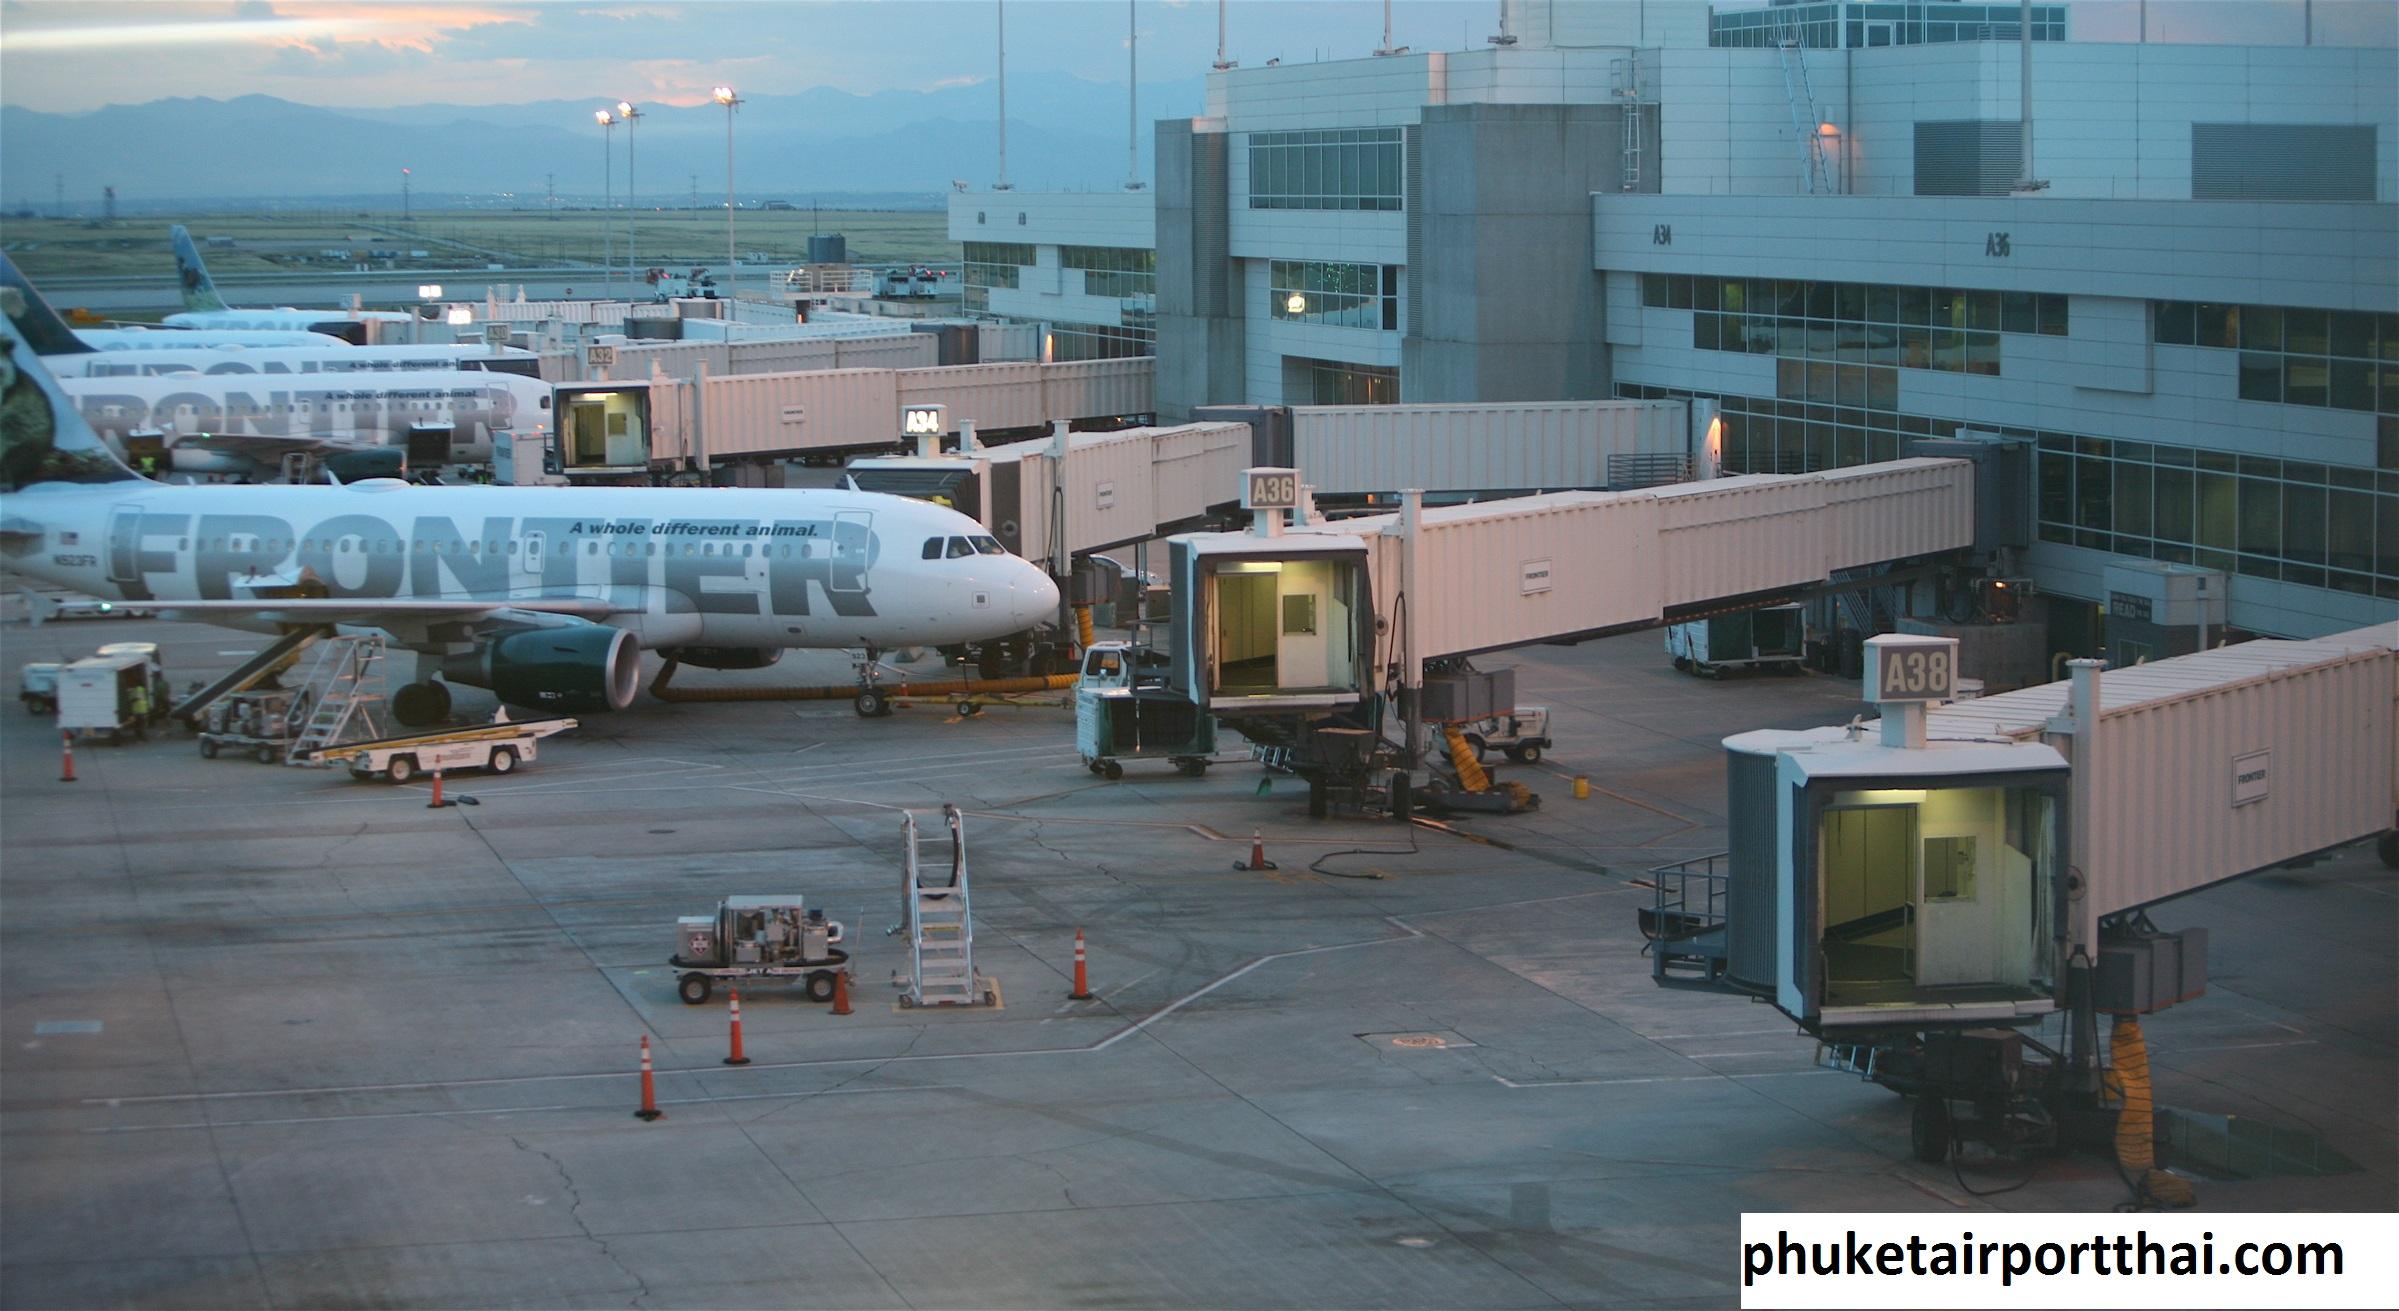 Jet bridge, Konektor Penumpang di Bandara Internasional Phuket Thailand